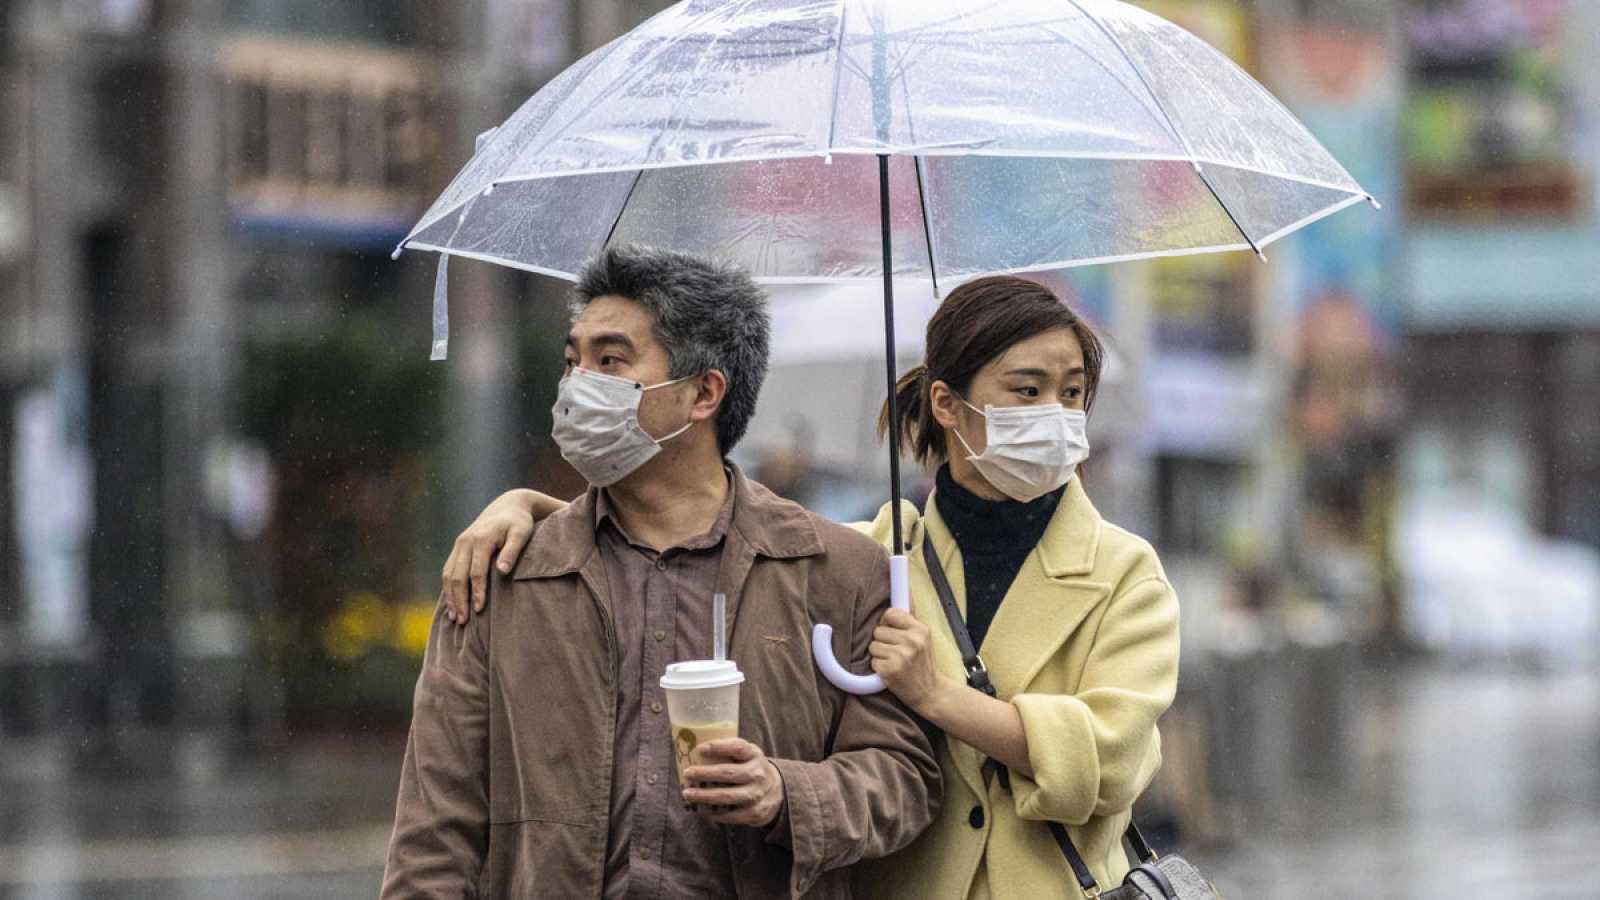 Una pareja pasea con mascarillas en Guangzhou, China